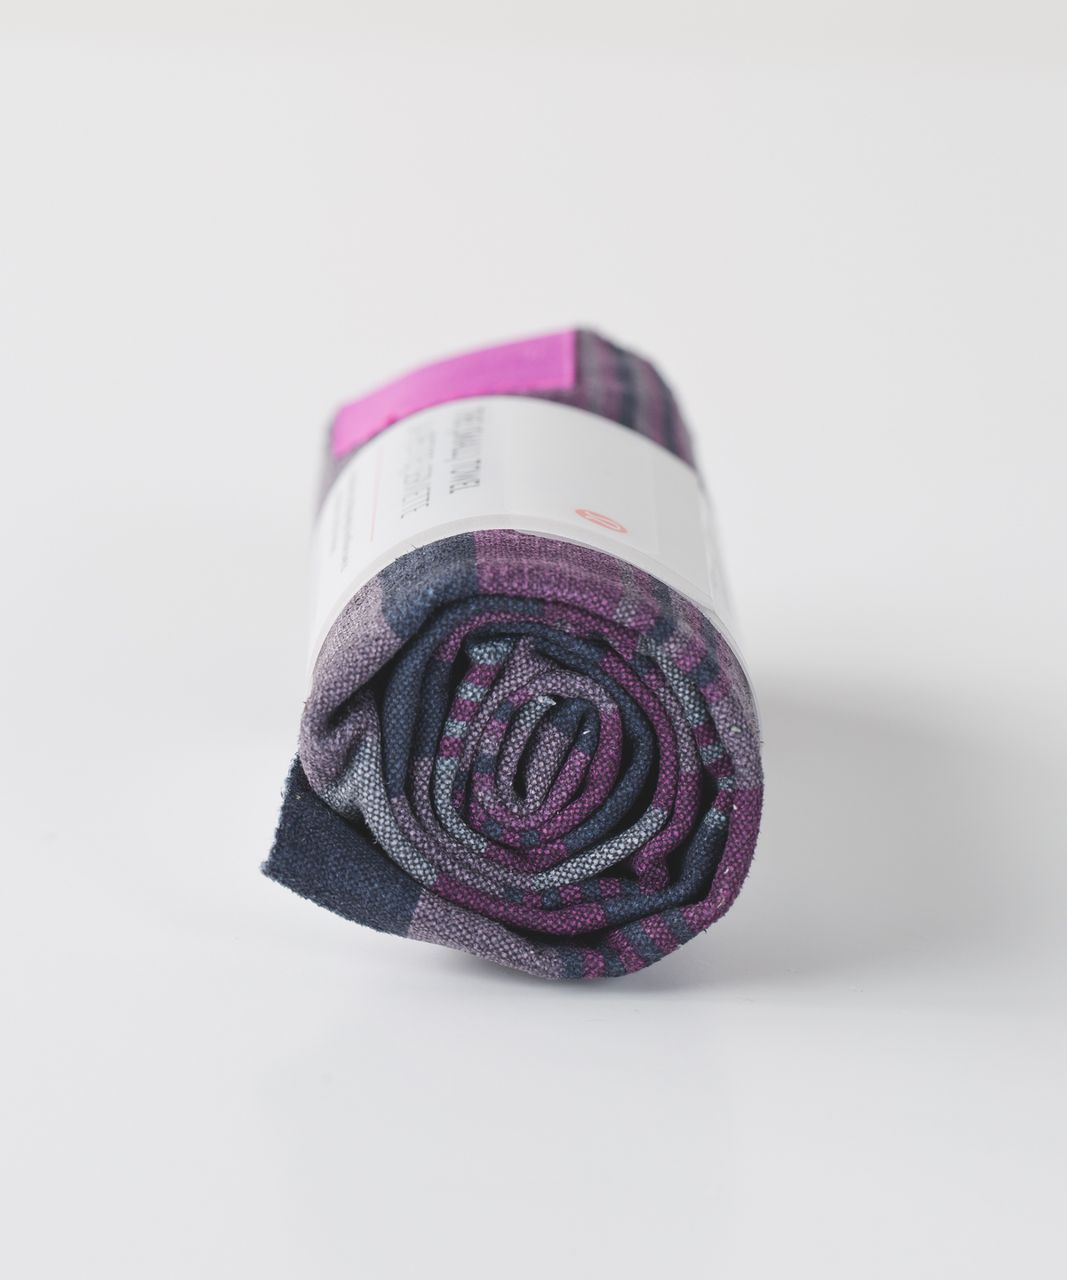 Lululemon The (Small) Towel - Giant Blanket Stripe Printed Regal Plum Mellow Magenta